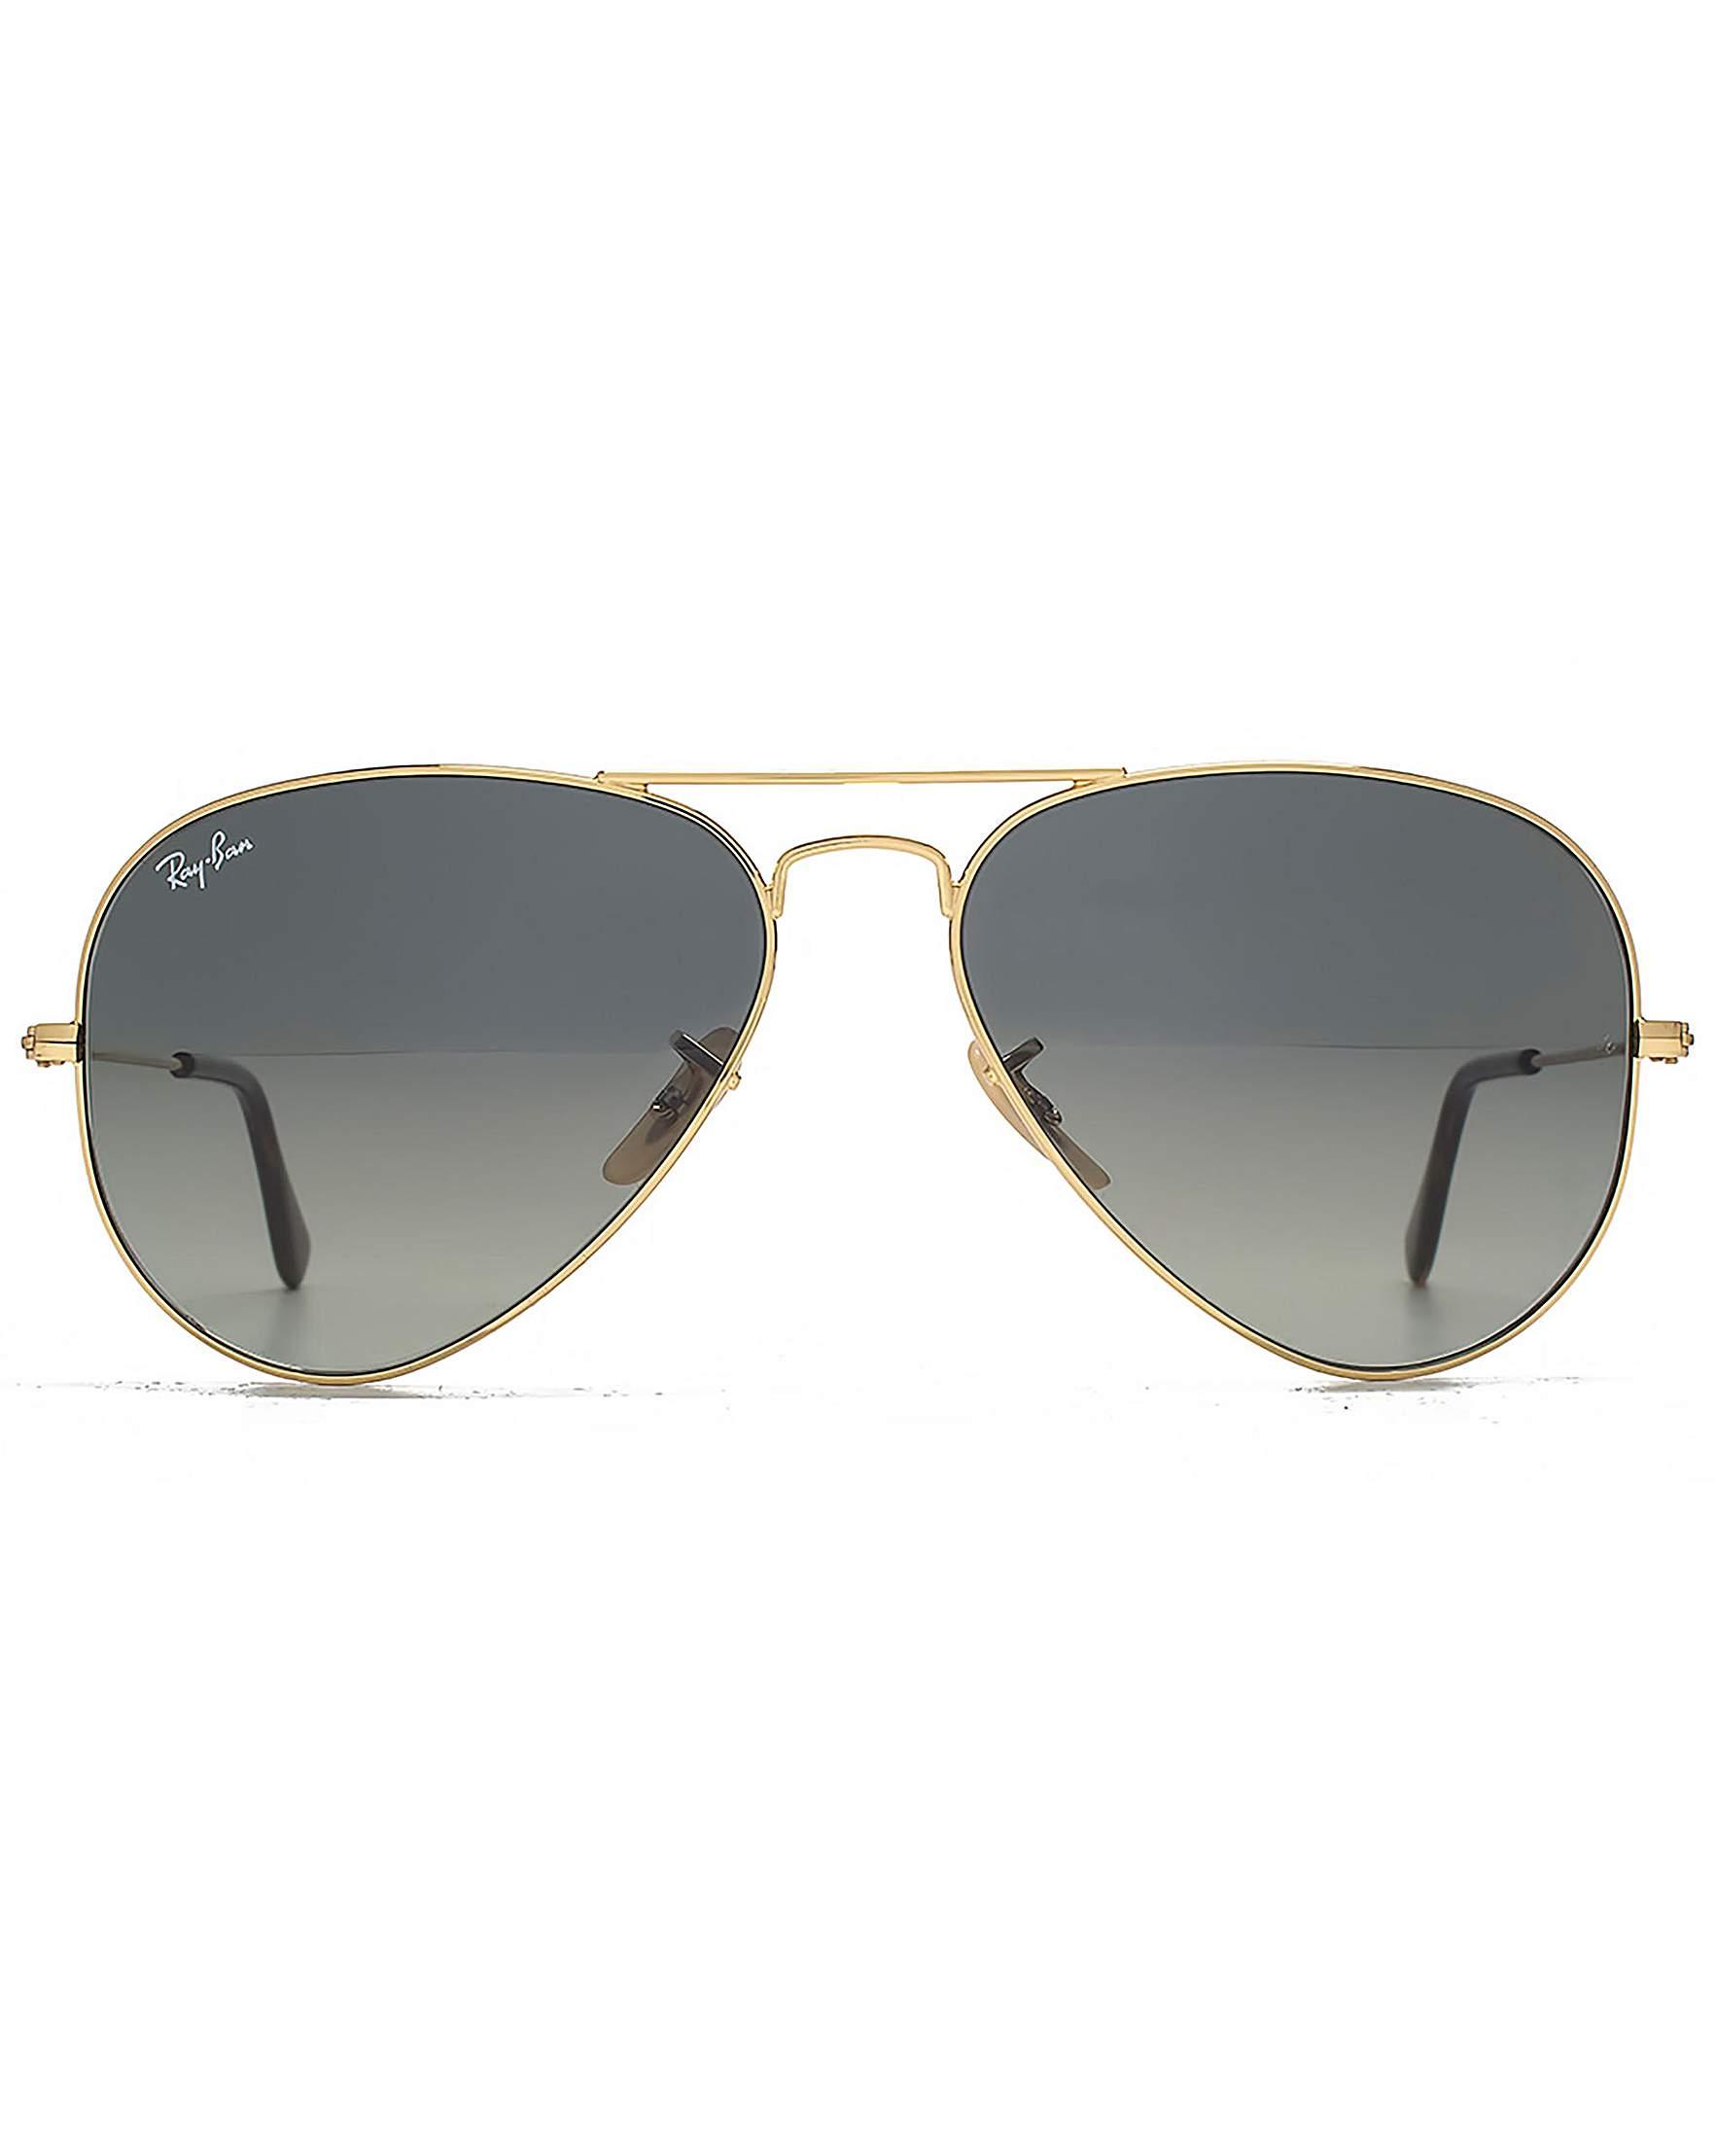 fdd425b1c4c Ray-Ban Classic Aviator Sunglasses